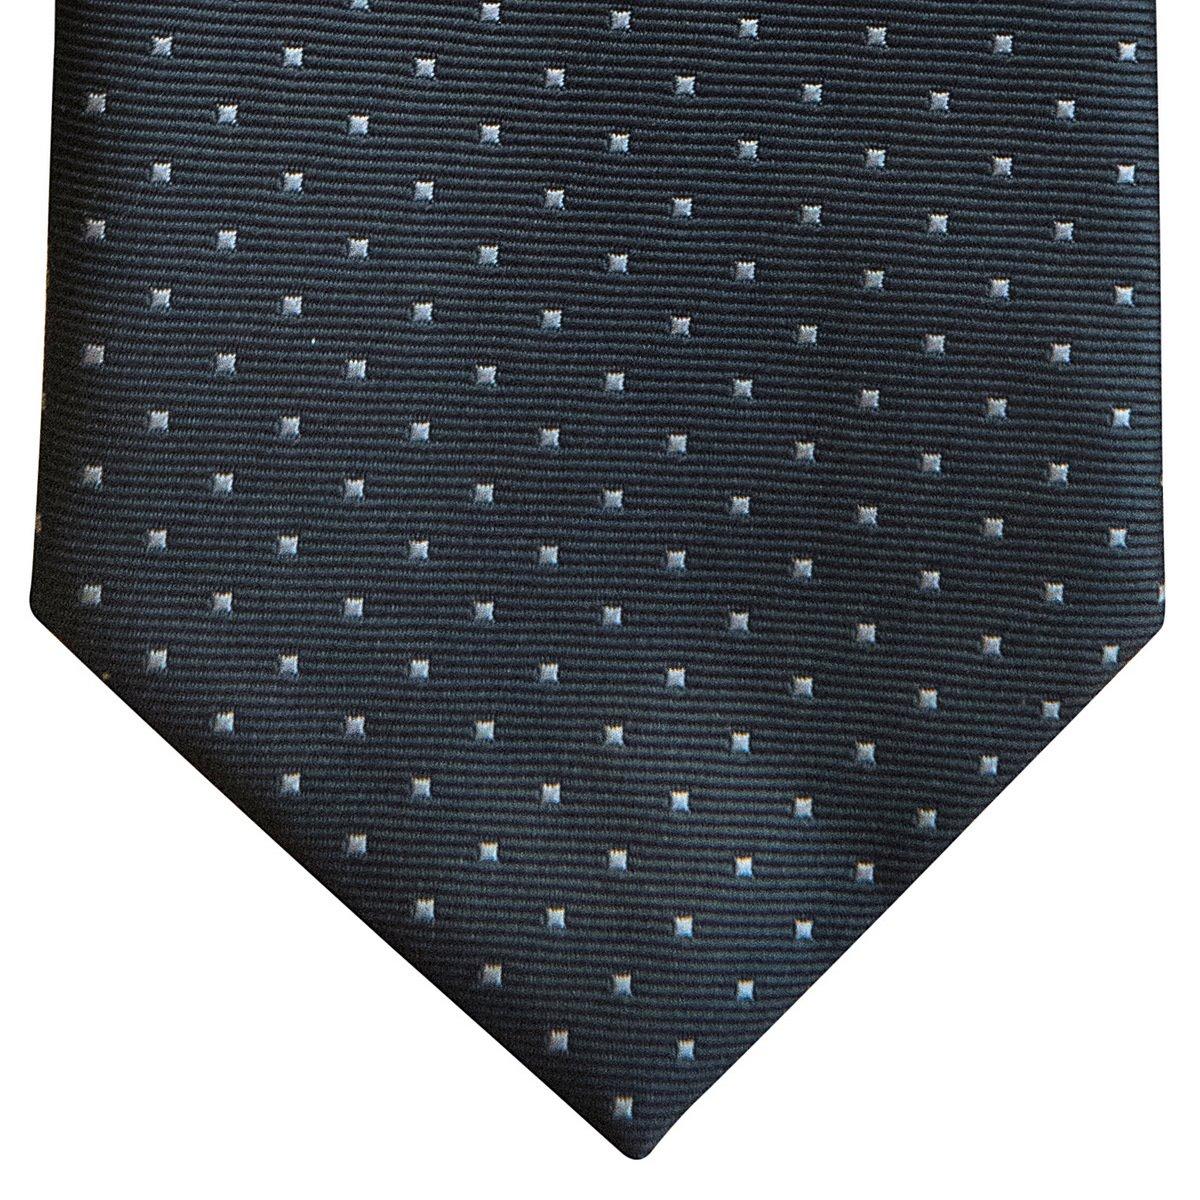 Retreez Pin Dots Woven Microfiber Boy's Tie (8-10 years) - Grey with Light Grey Pin Dots by Retreez (Image #2)